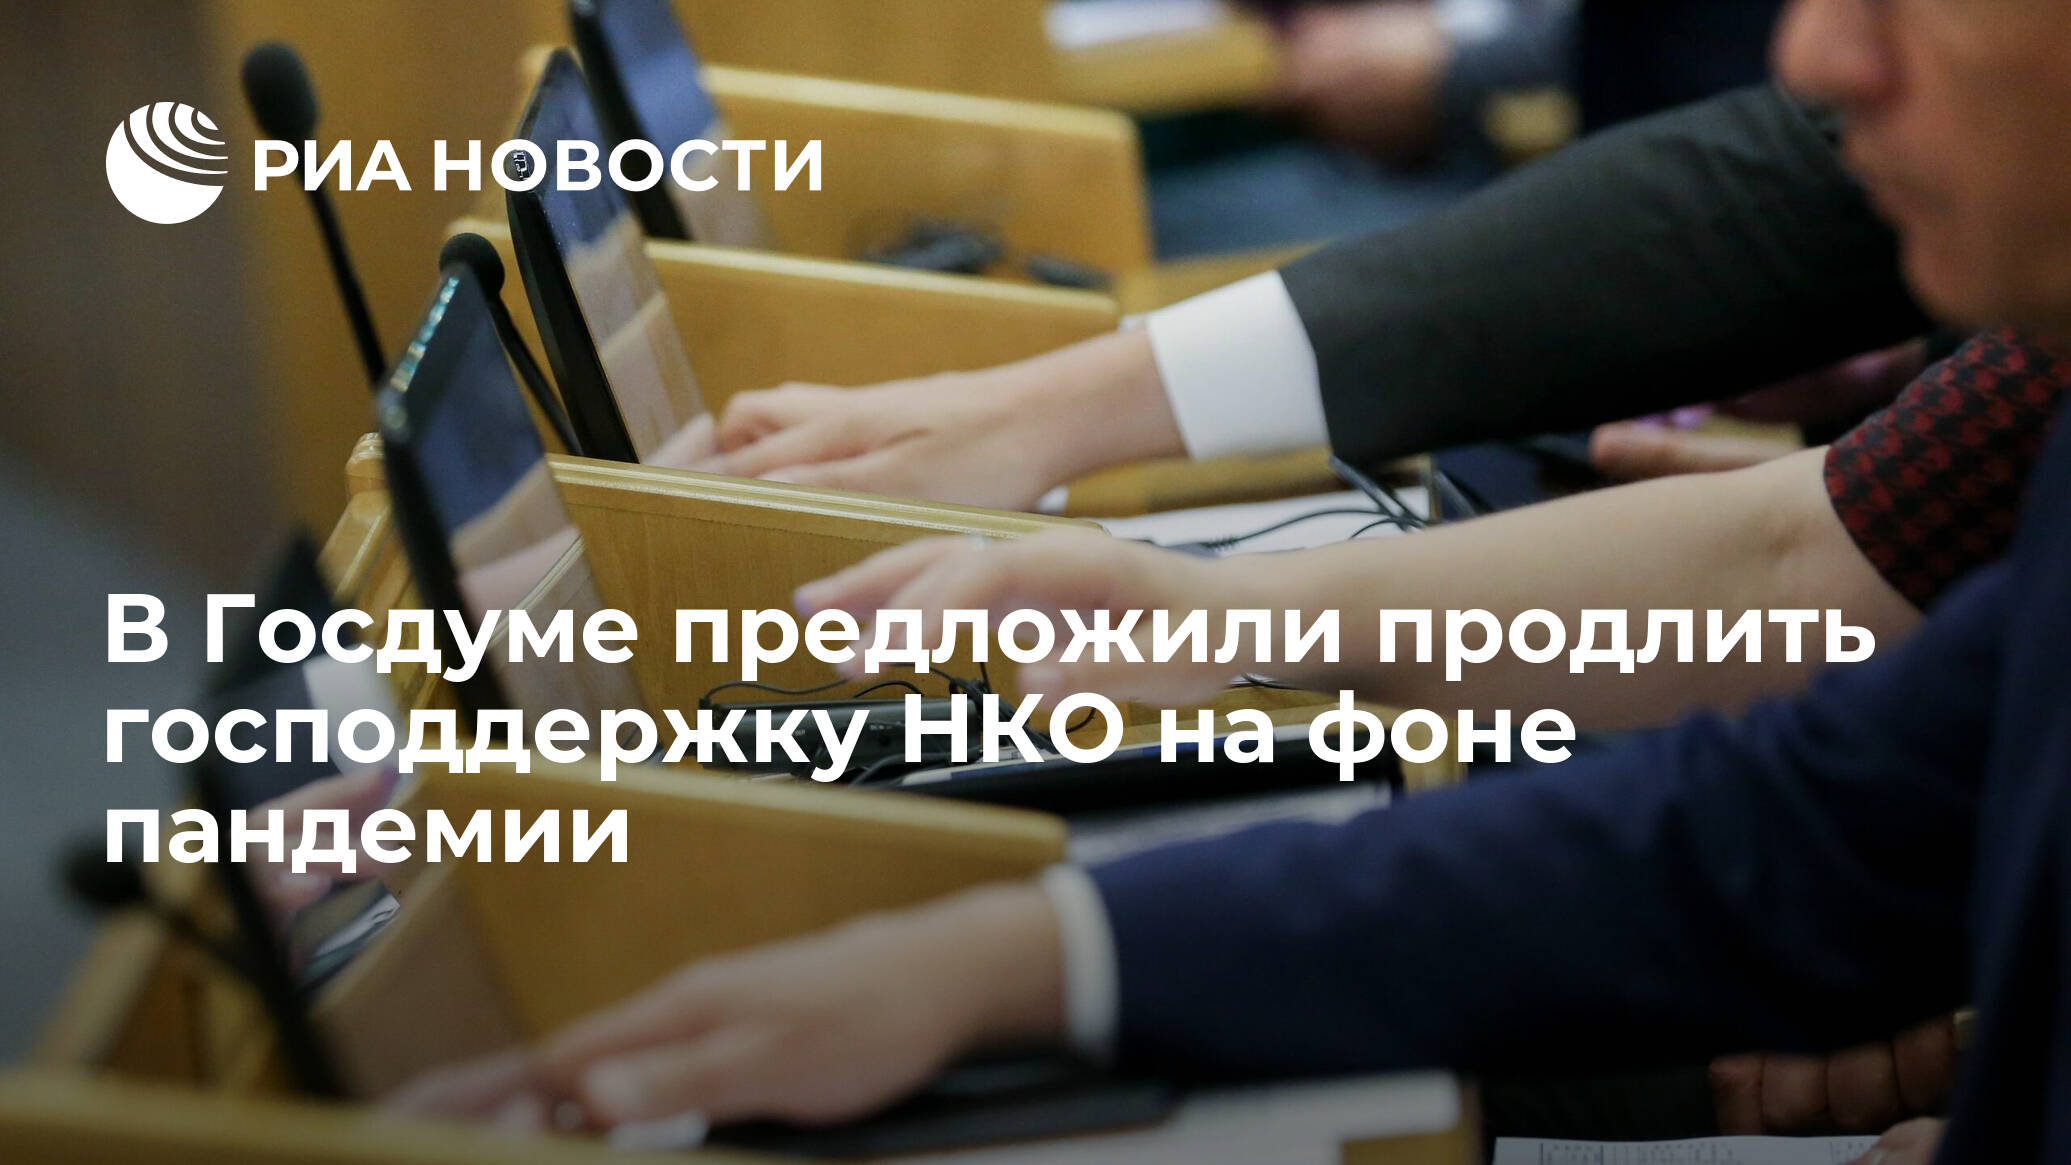 В Госдуме предложили продлить господдержку НКО на фоне пандемии